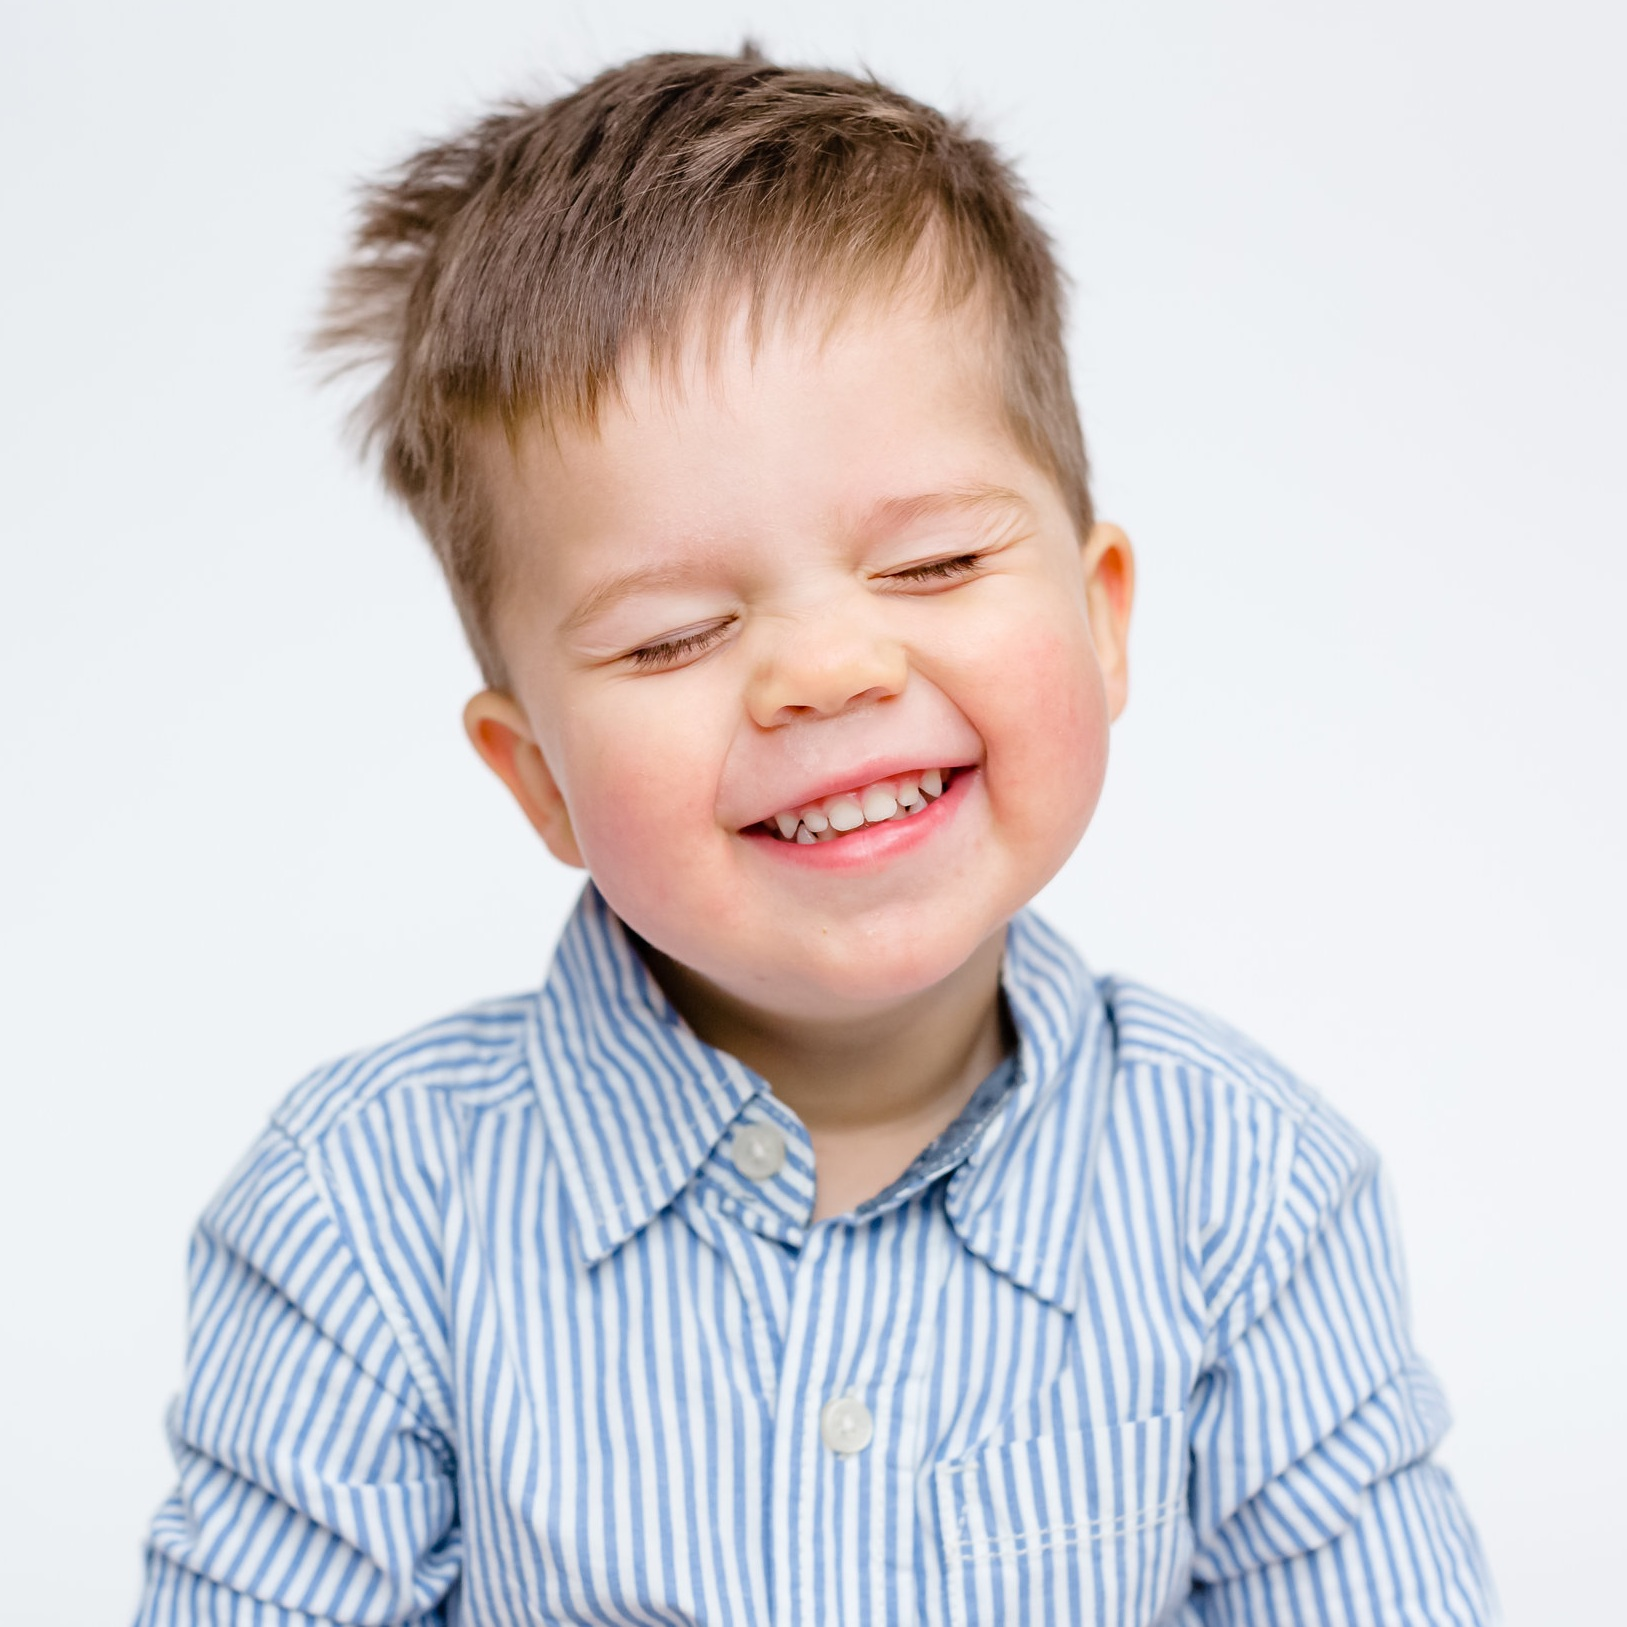 modern preschool candid squint smile boy portrait